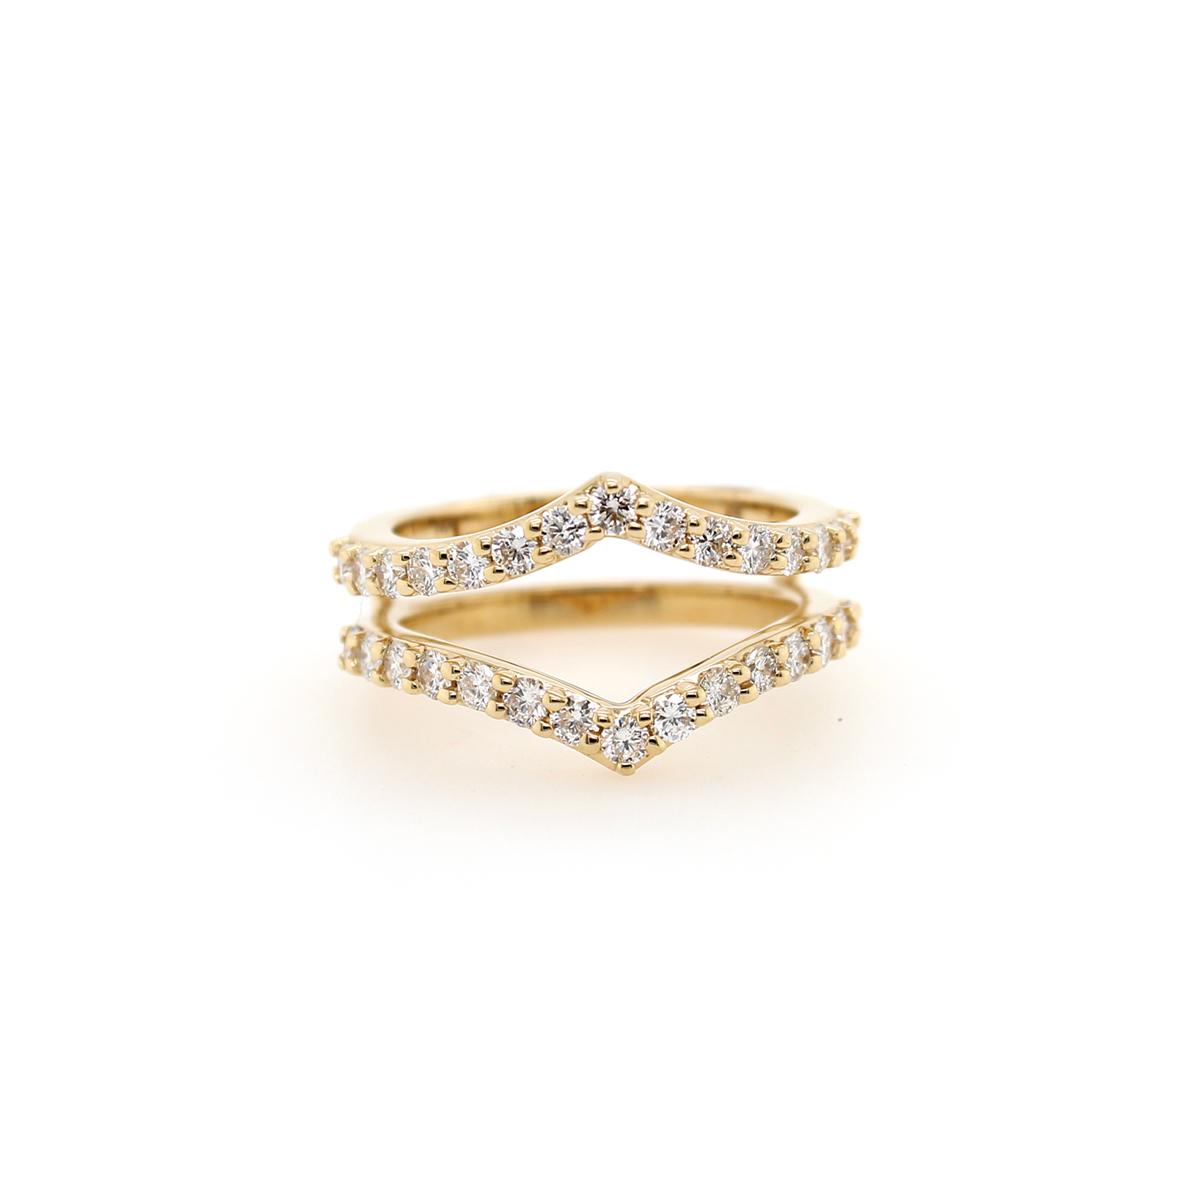 Shefi Diamonds 14 Karat Yellow Gold 1 Carat Diamond Sharp Curve Ring Jacket